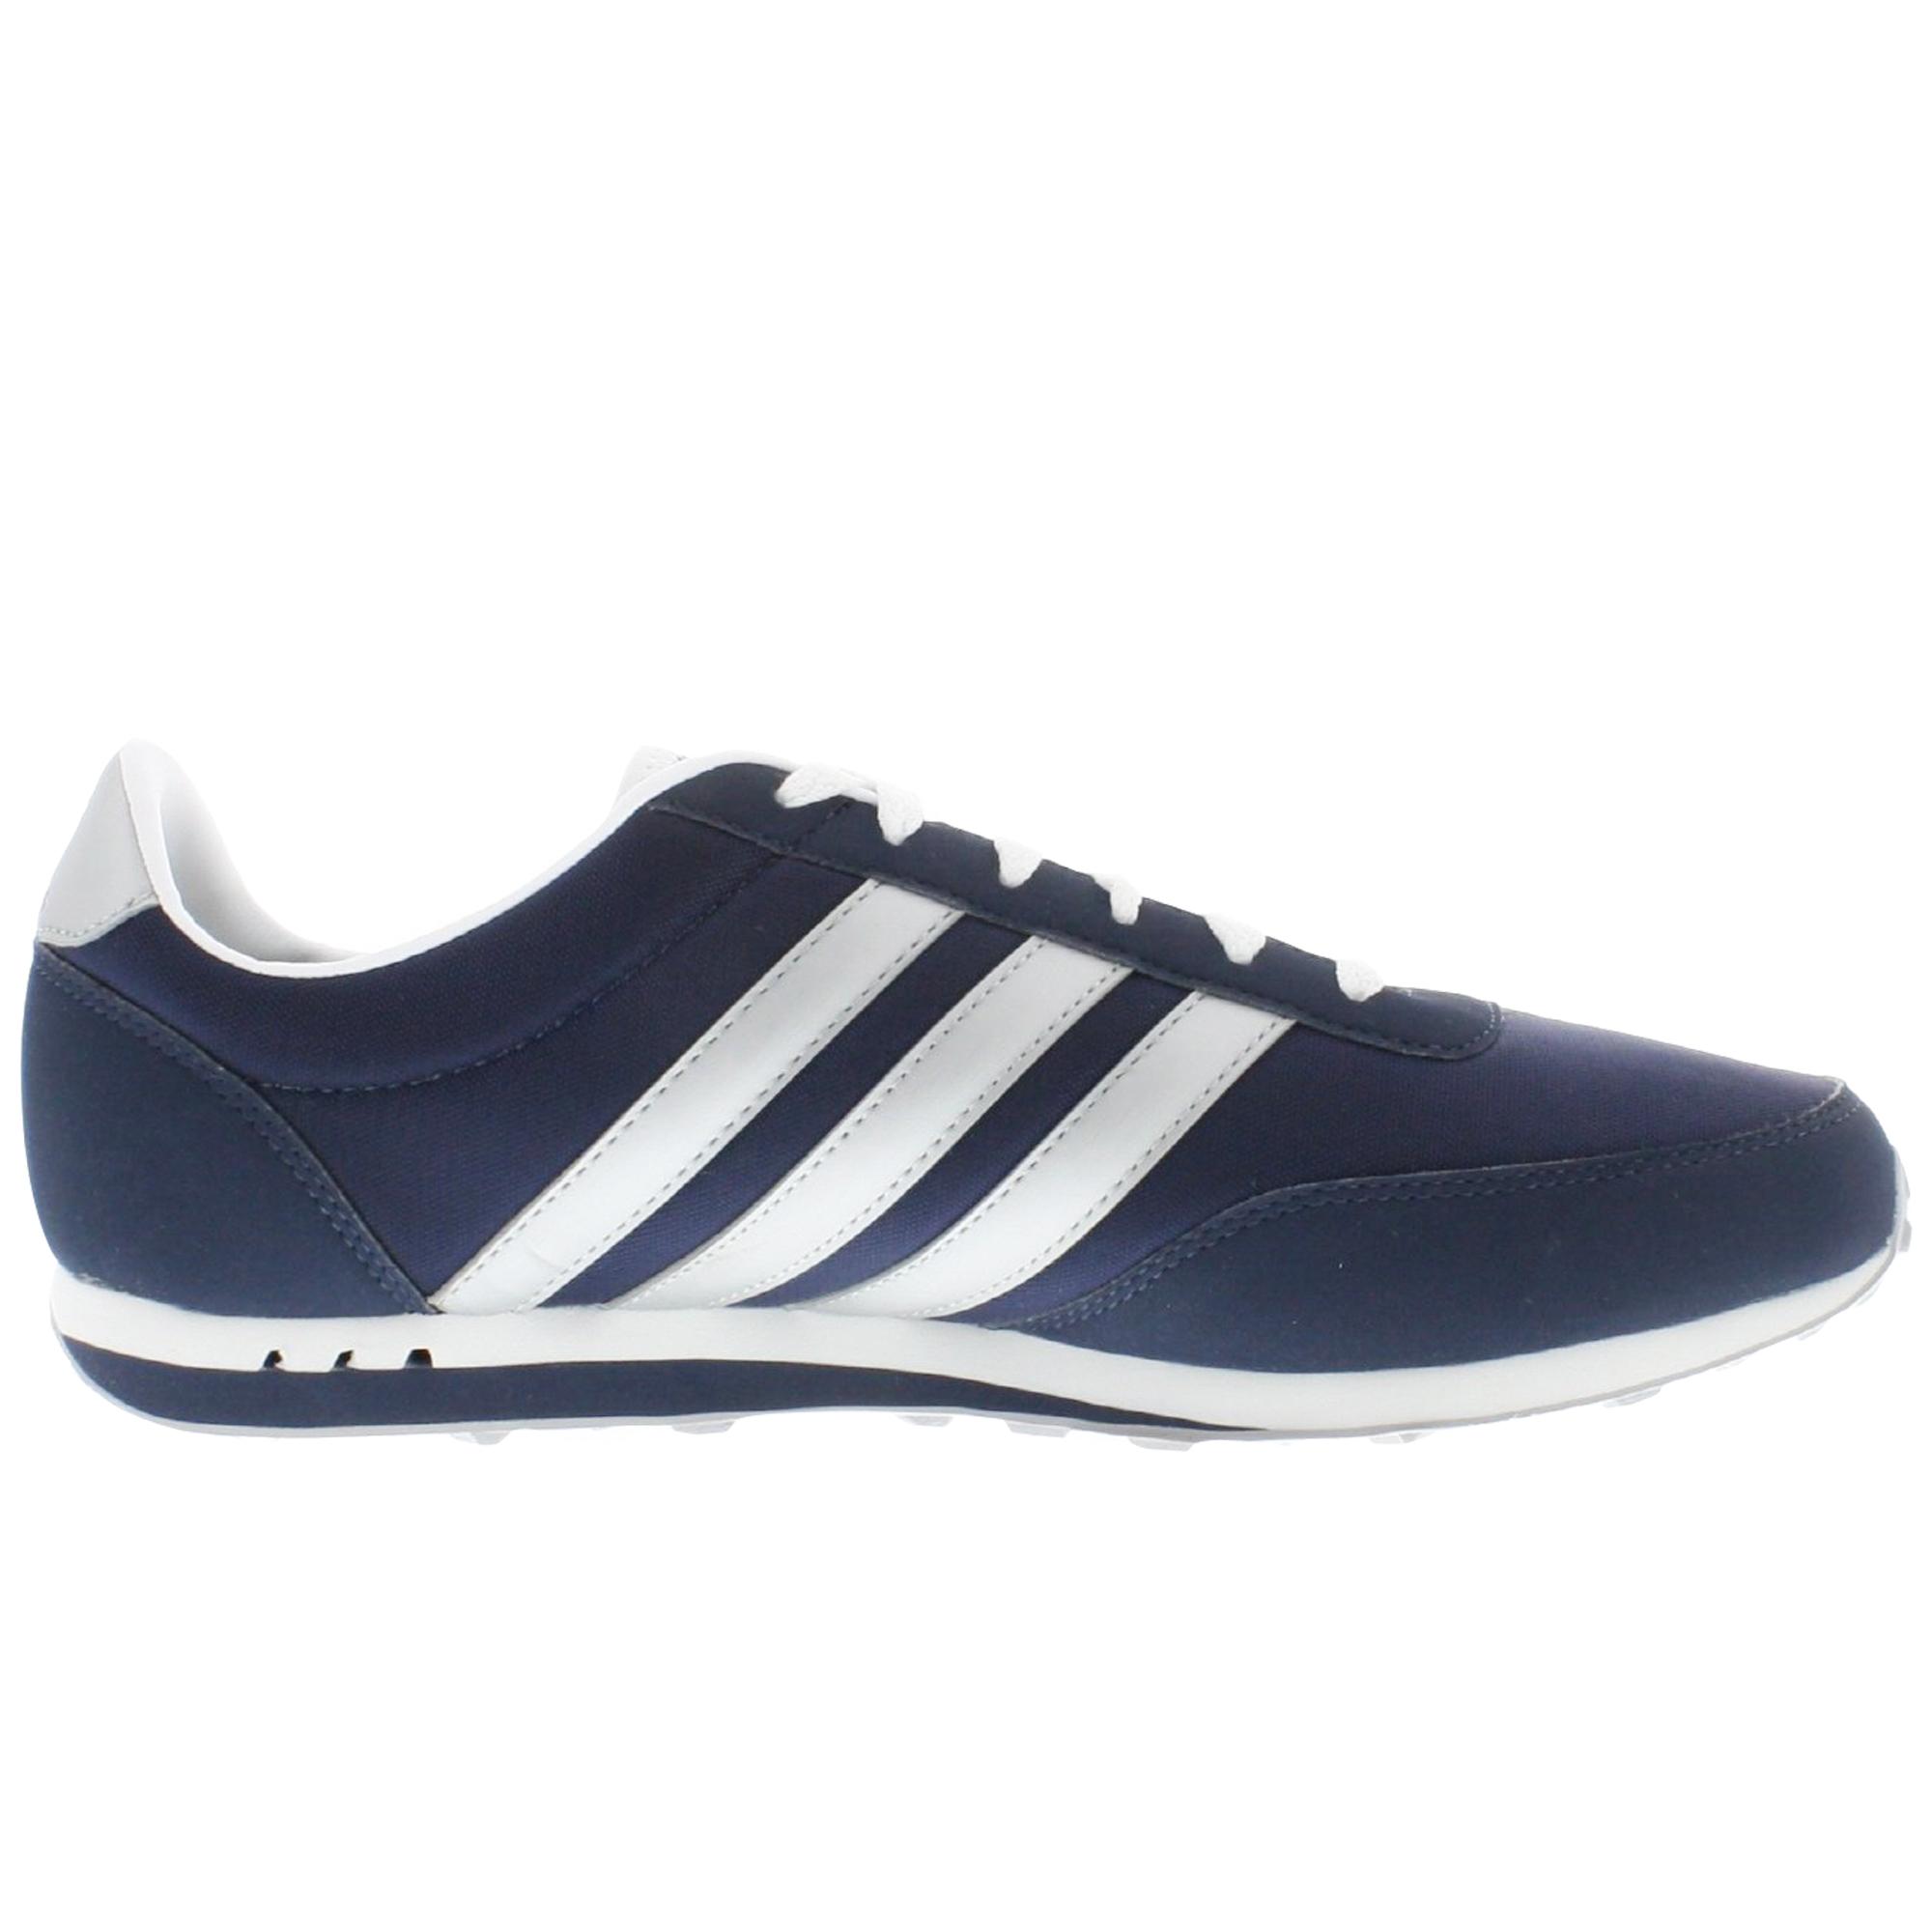 the best attitude 70232 53edb ... new style adidas neo v racer nylon spor ayakkabi g53401 a047b e2e64